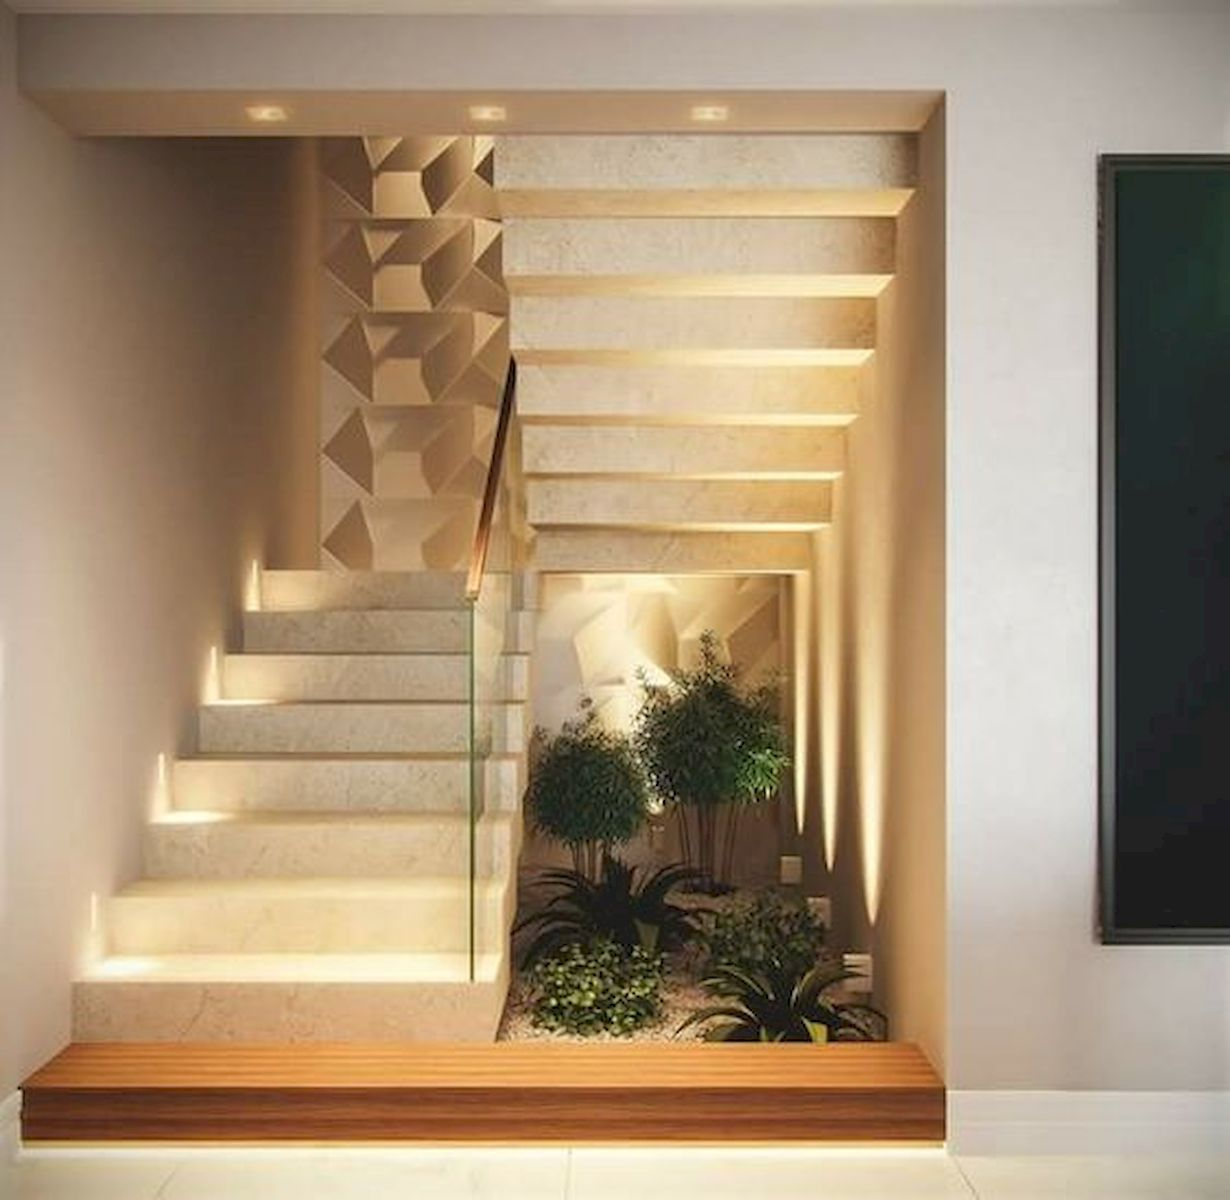 10 Indoor Garden Office and Office Plants Design Ideas For Summer